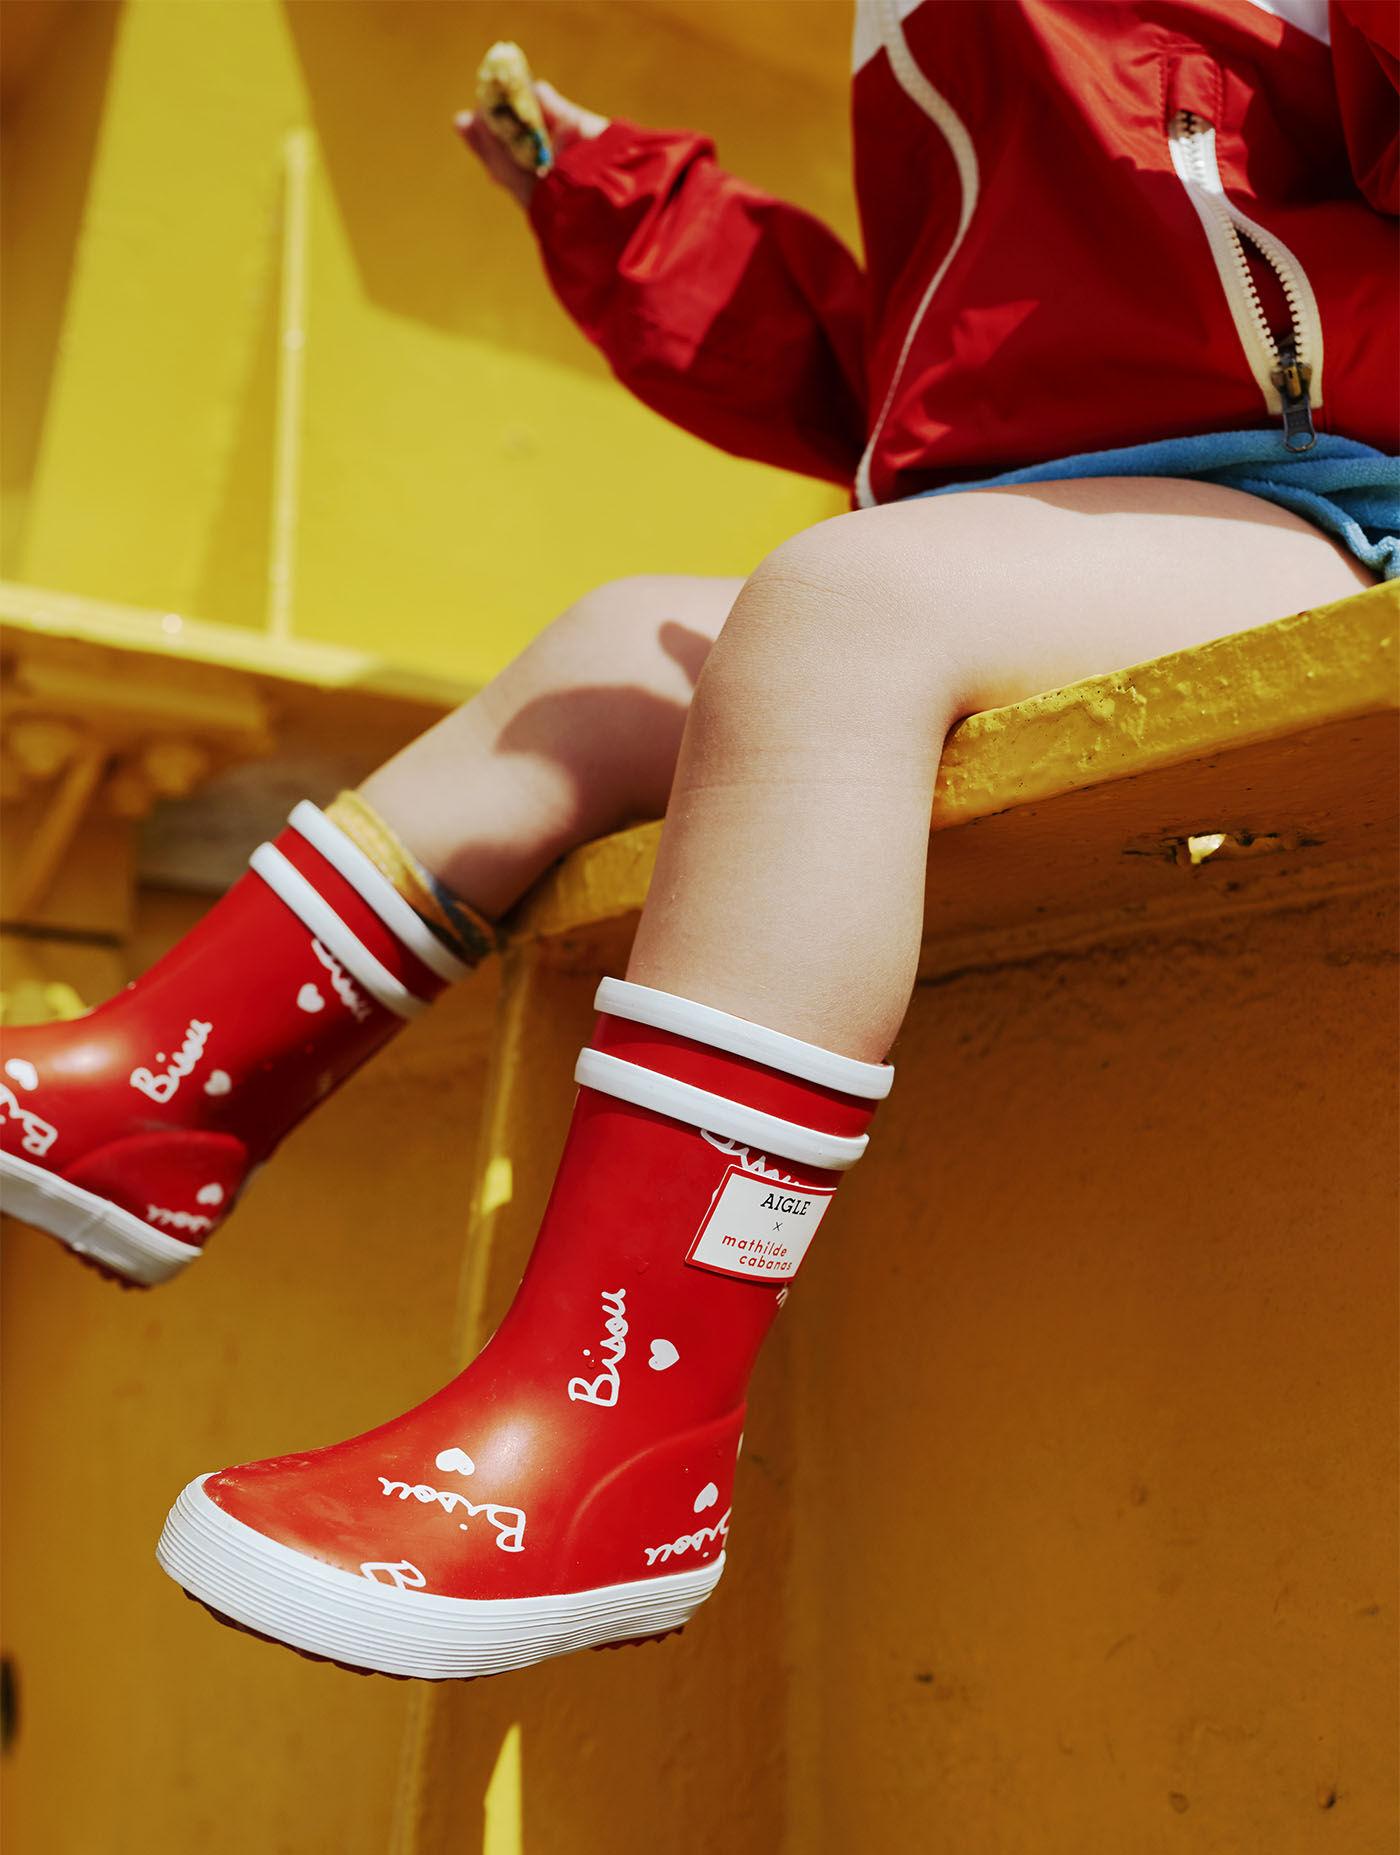 X Mathilde – Collab' Mode Enfant Et Aigle Cabanas Femme 13cTlFKJ